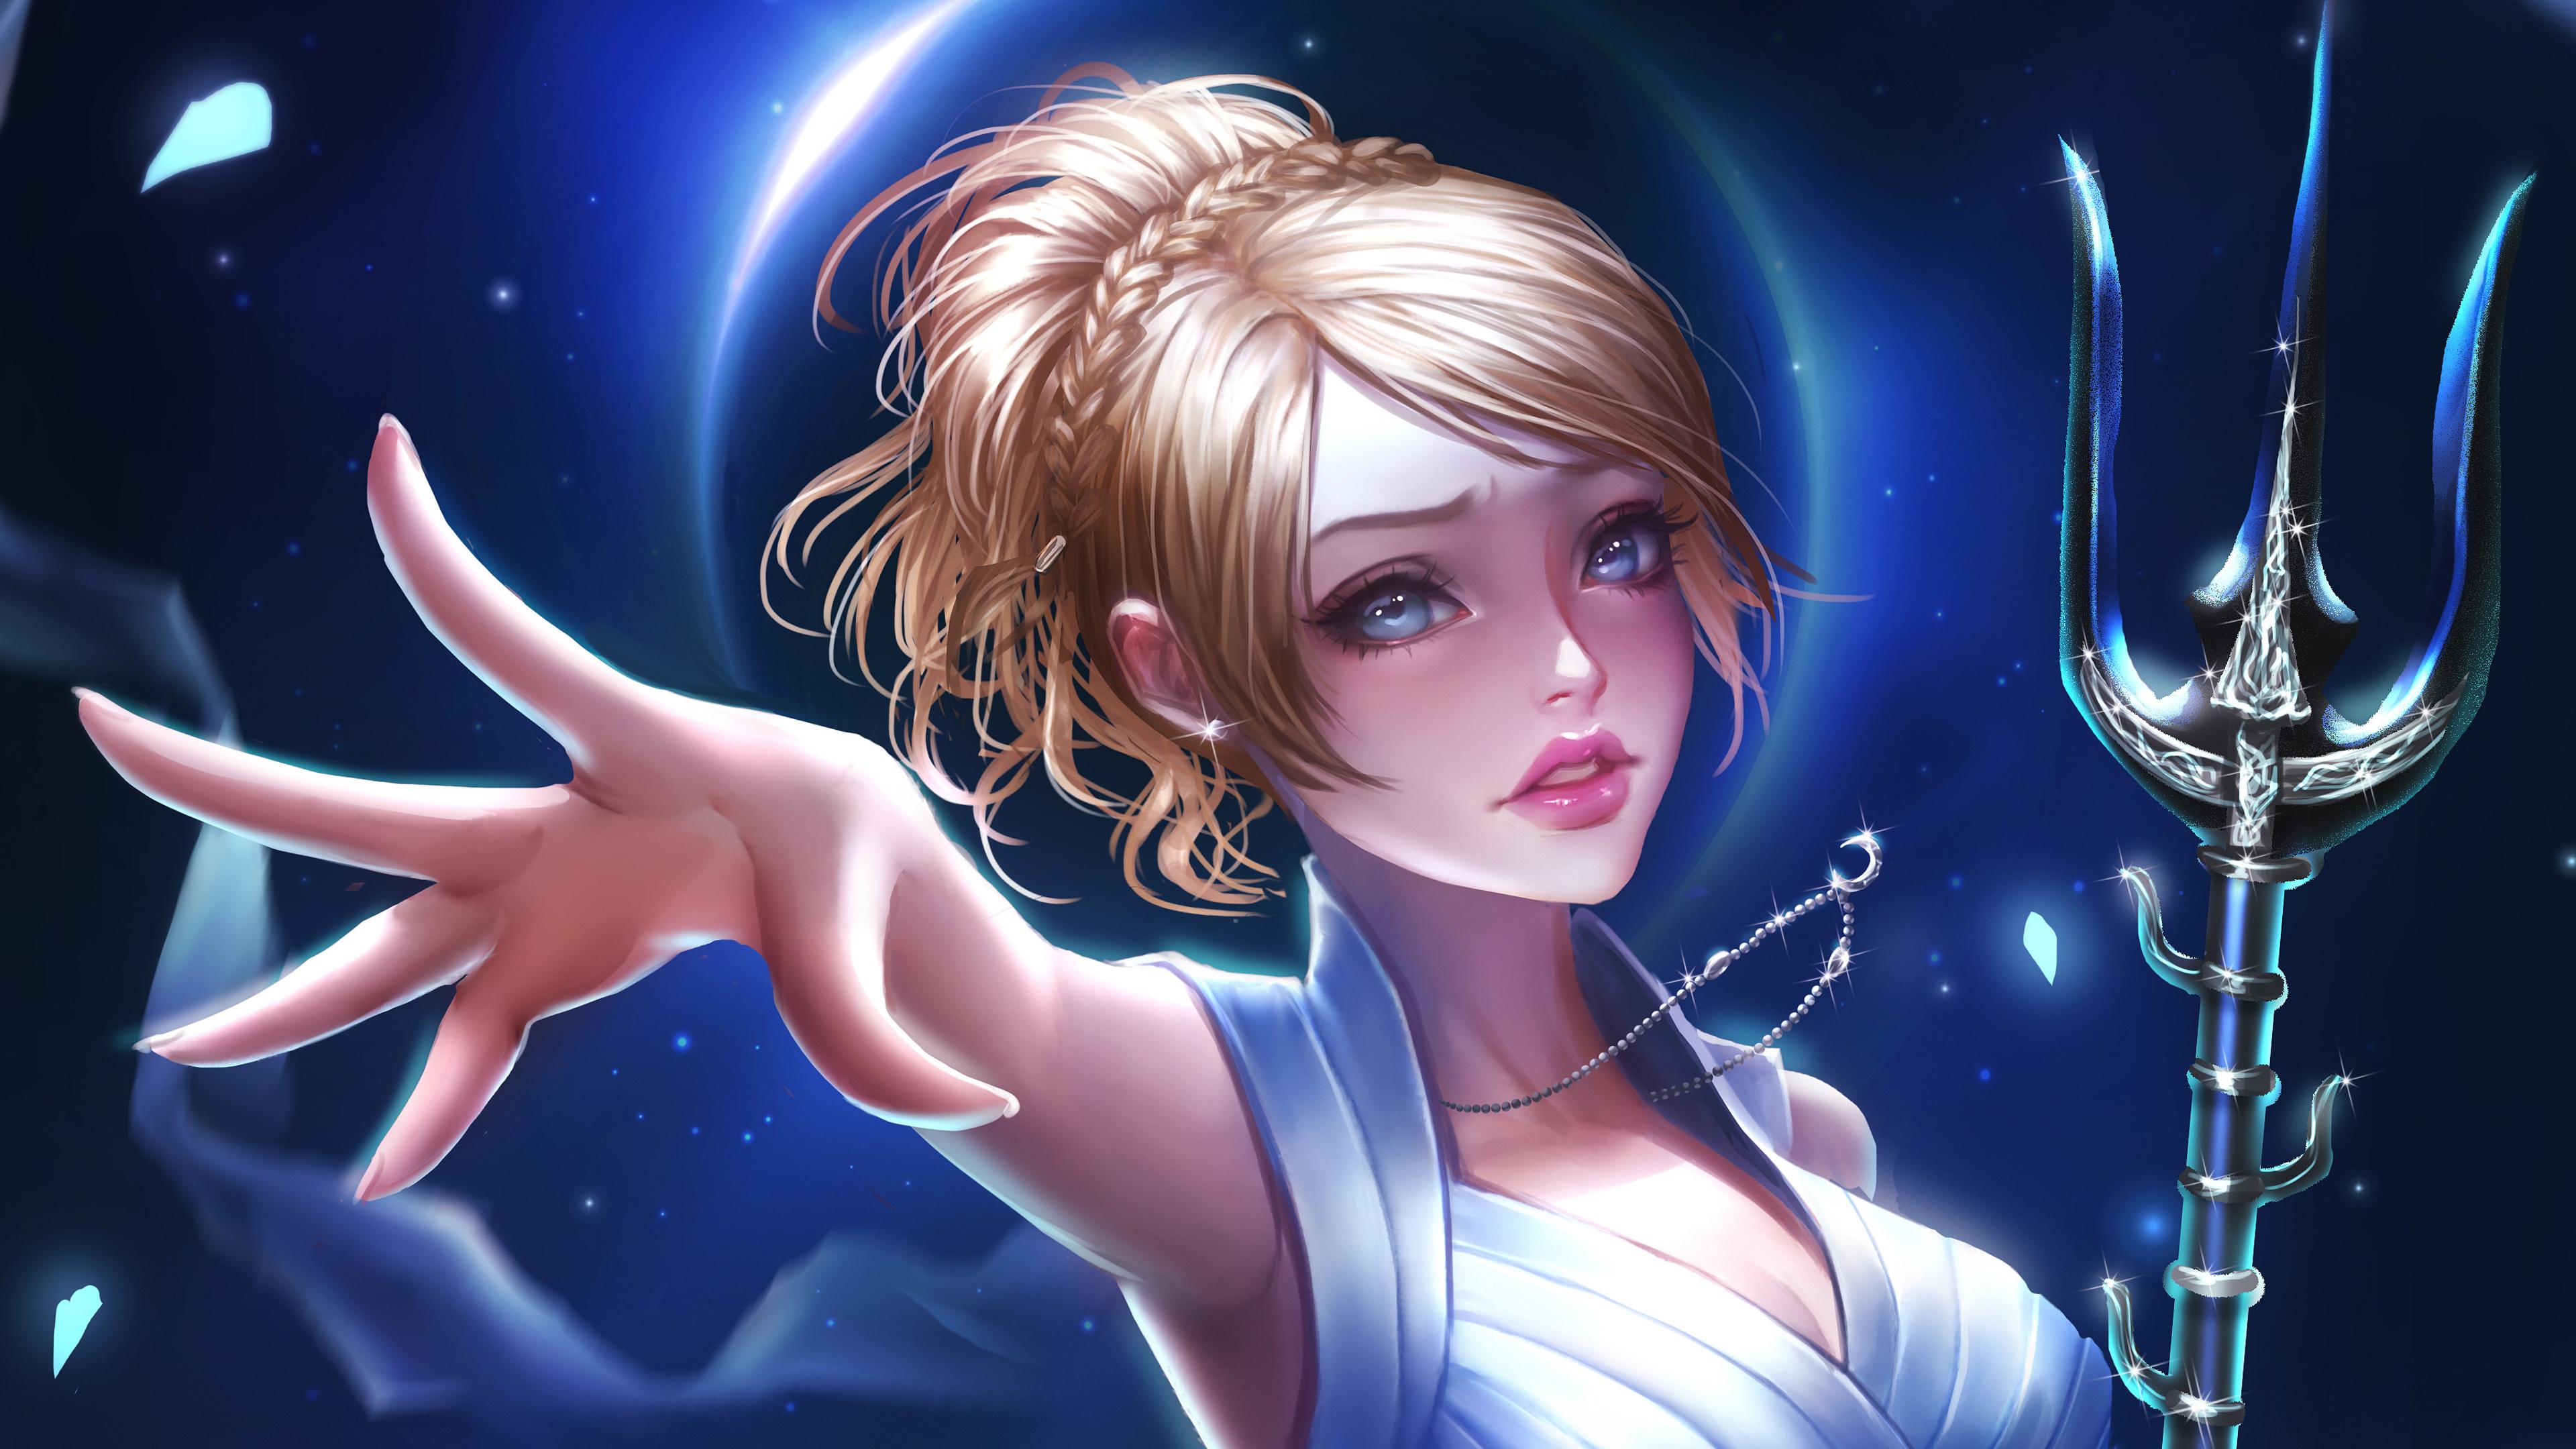 2560x1080 Luna Final Fantasy Xv 4k 2560x1080 Resolution Hd: 3840x2160 Lunafreya Nox Fleuret Final Fantasy XV 4k